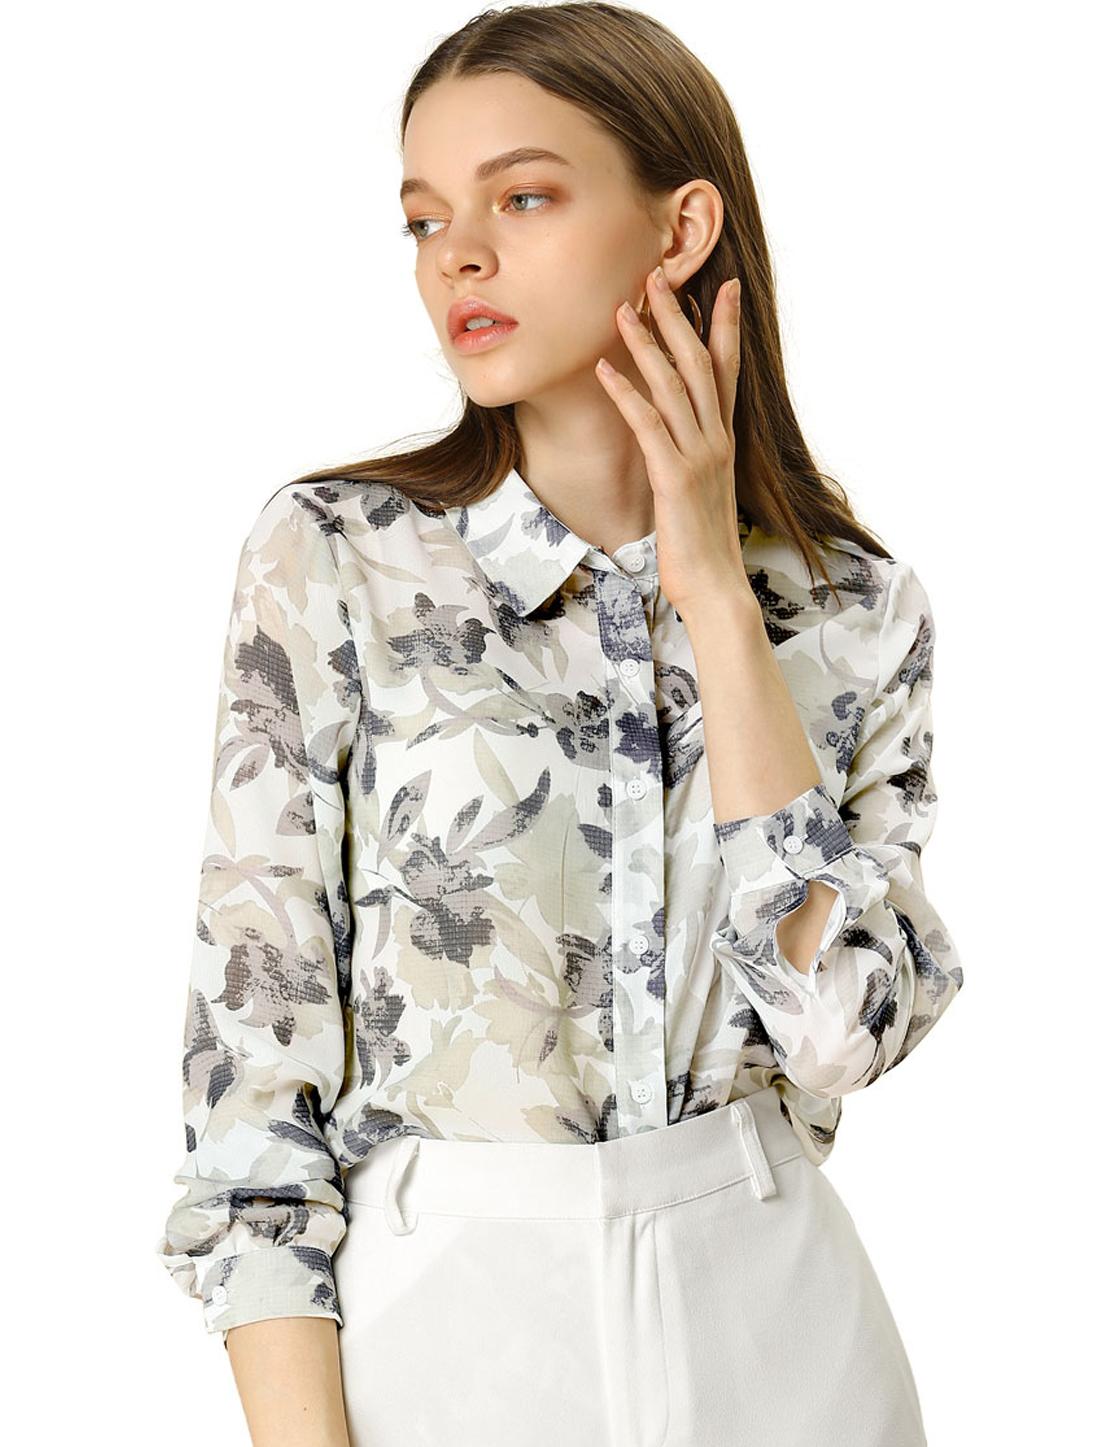 Allegra K Women's Floral Print Button Up Shirt Long Sleeves Vintage Top Gray XL